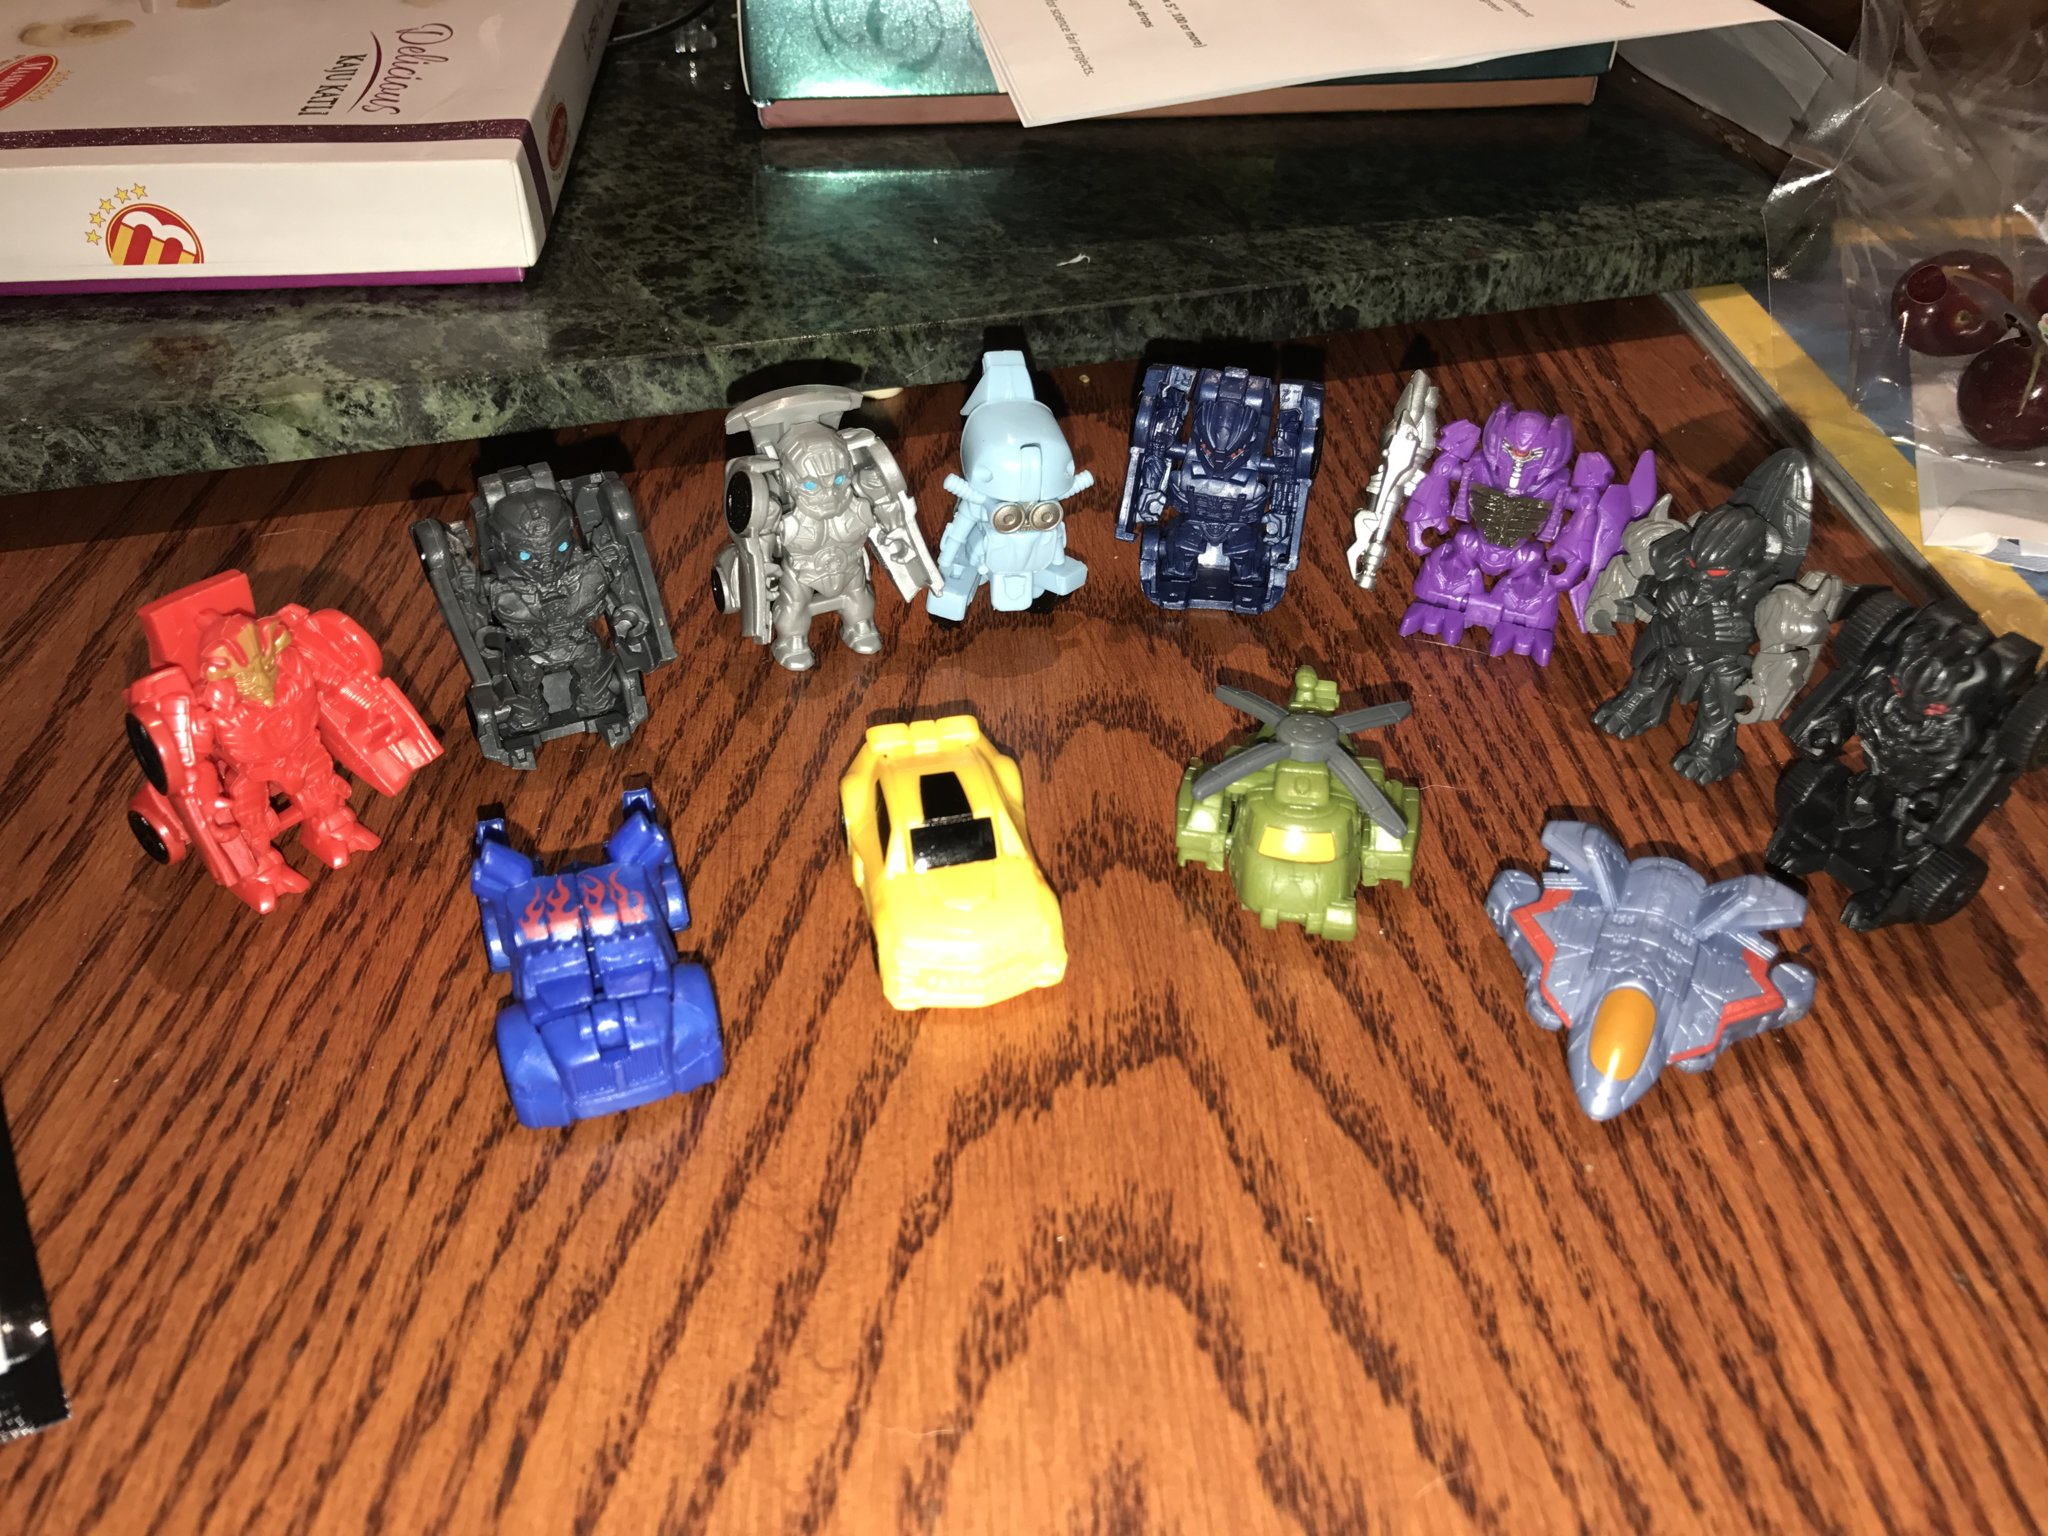 Transformers The Last Knight Tiny Turbo Changers Series 4 Grimlock